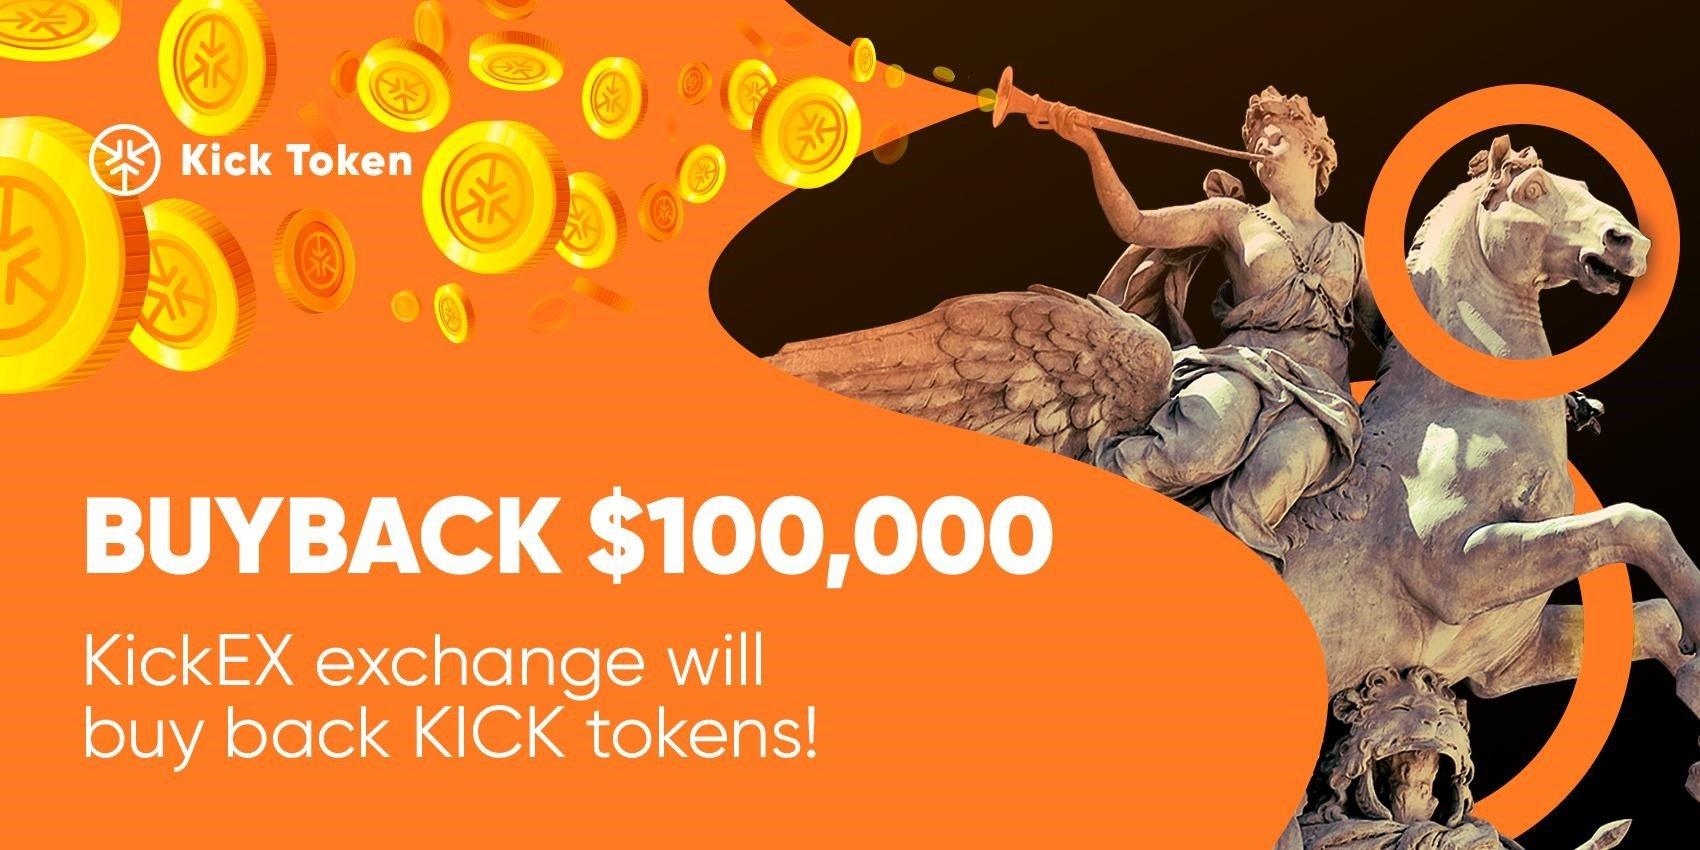 The Kickex Exchange Will Buy Back Kicktokens At A Price Of 0 00015 Per Token Newsbtc